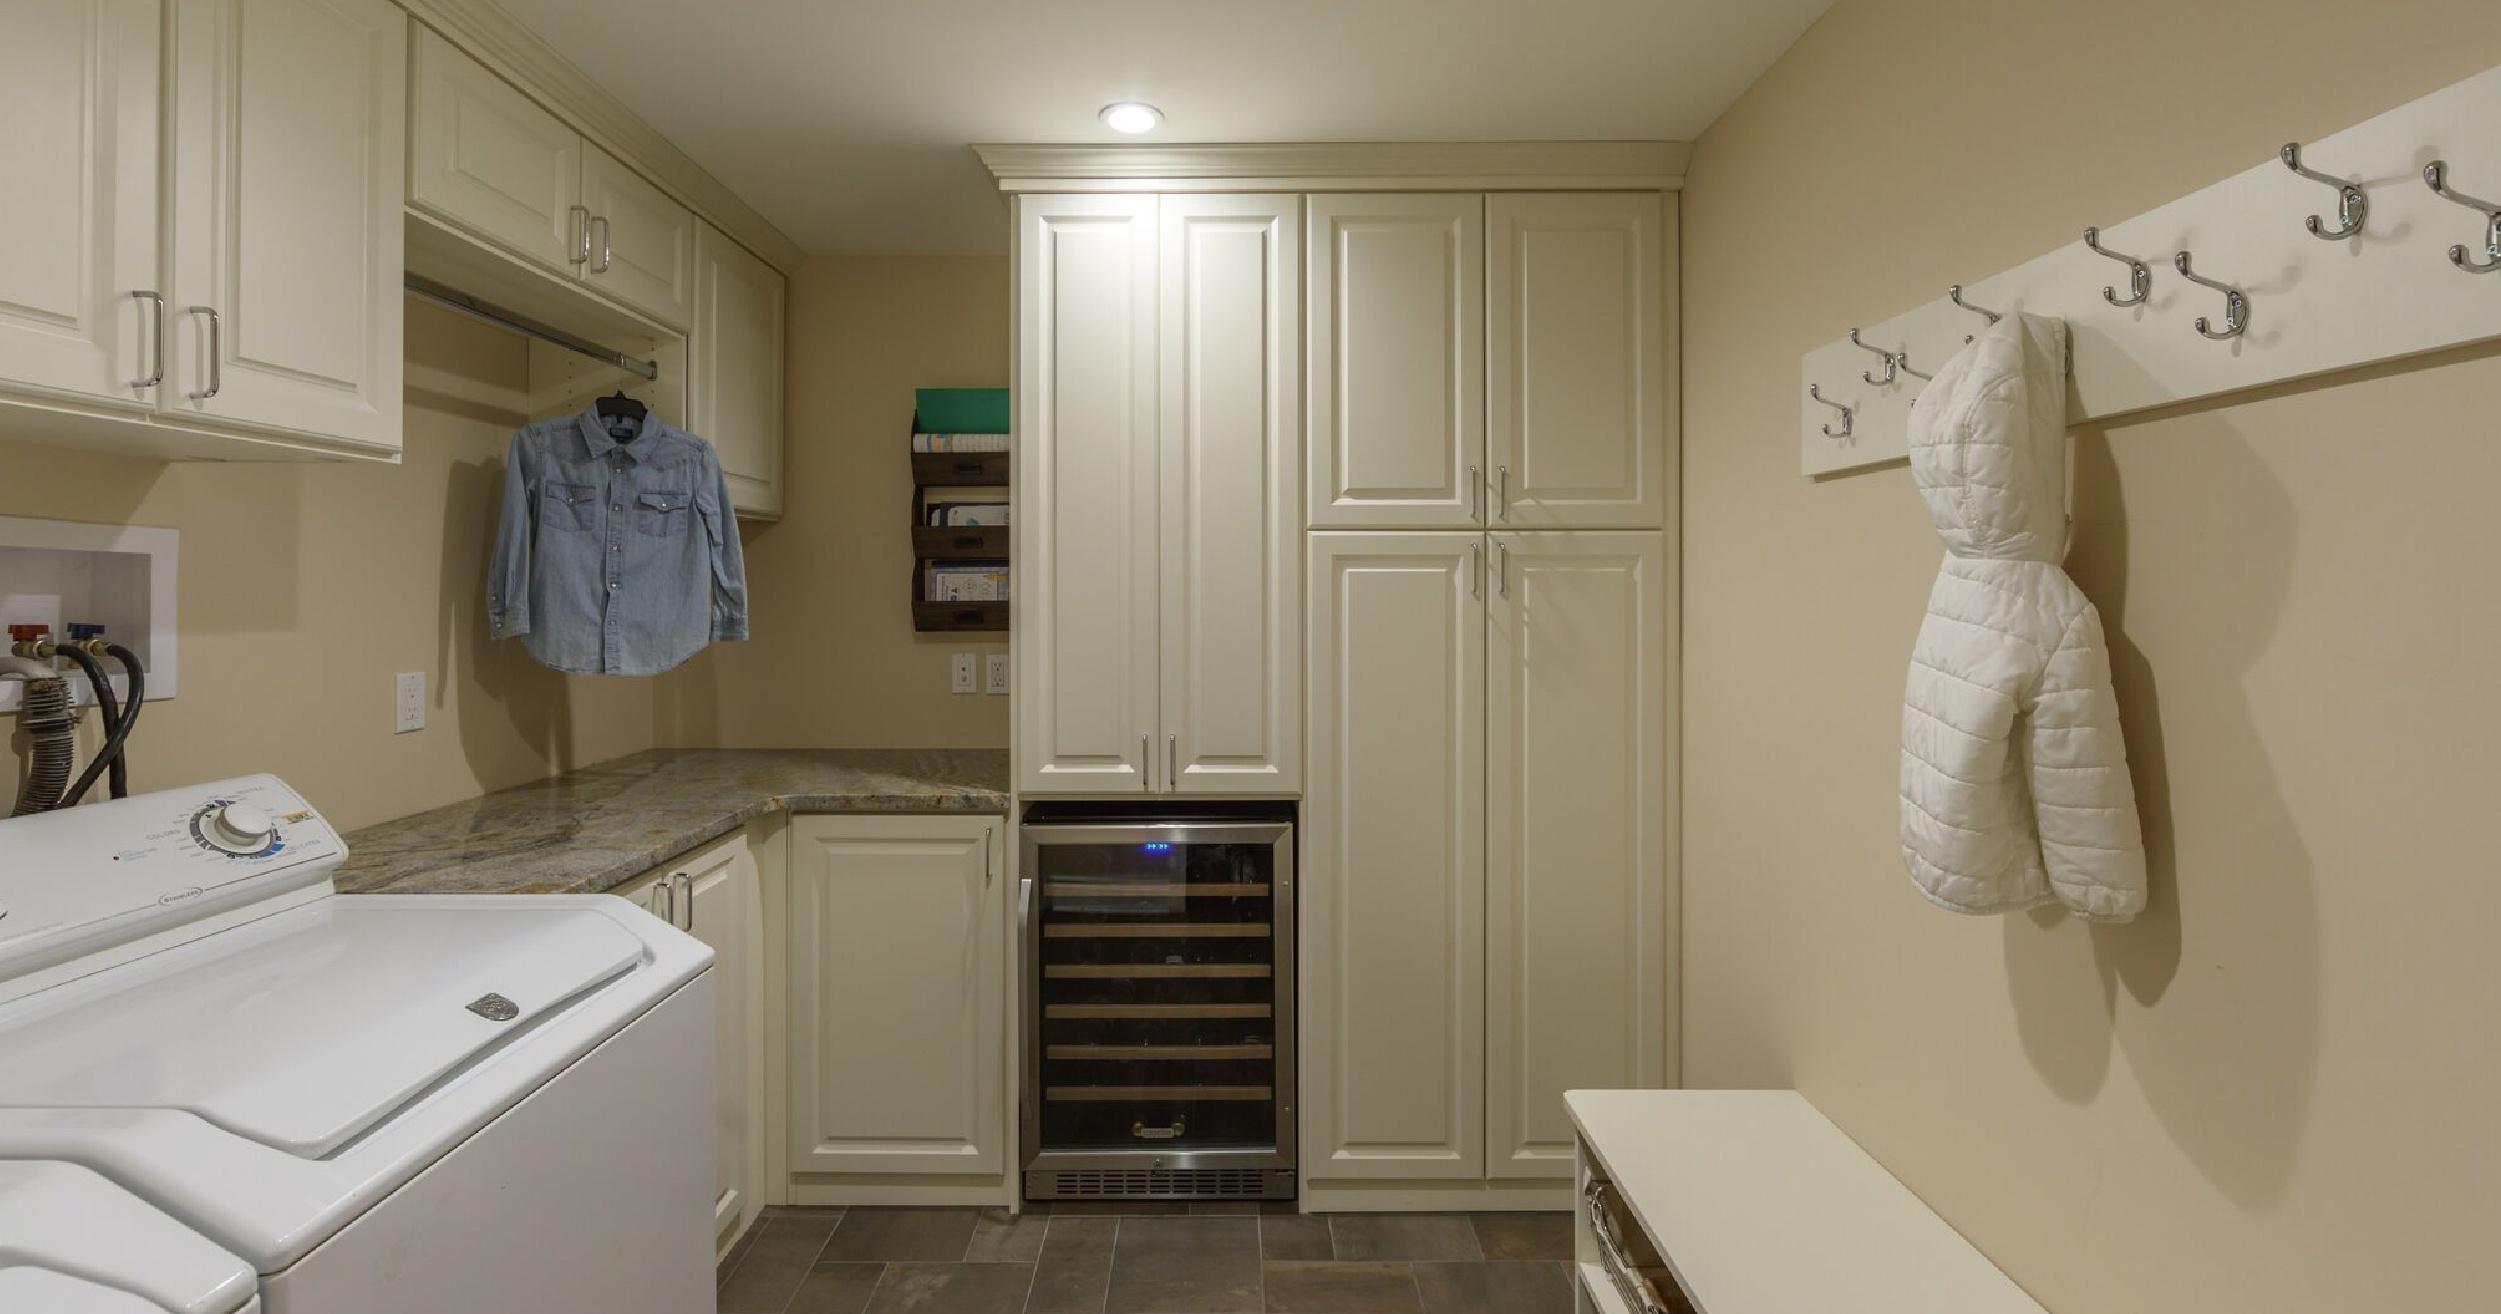 gw-combs-laundry-03.jpg